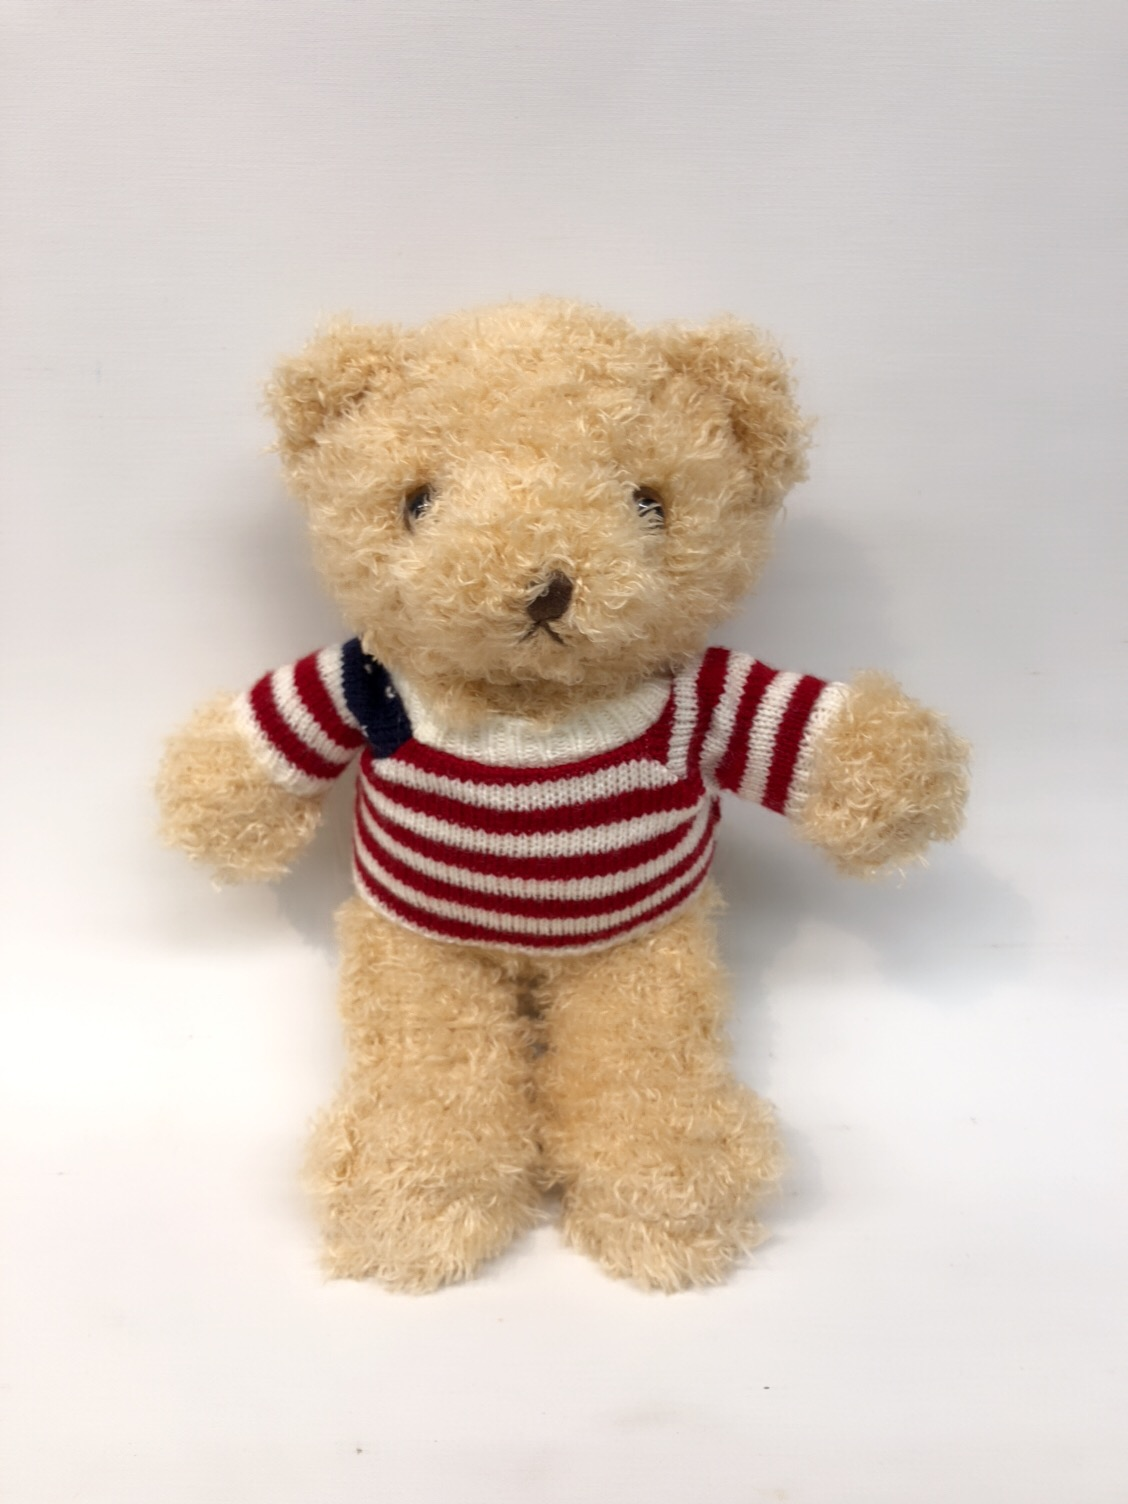 Star and striped Teddy Bear -